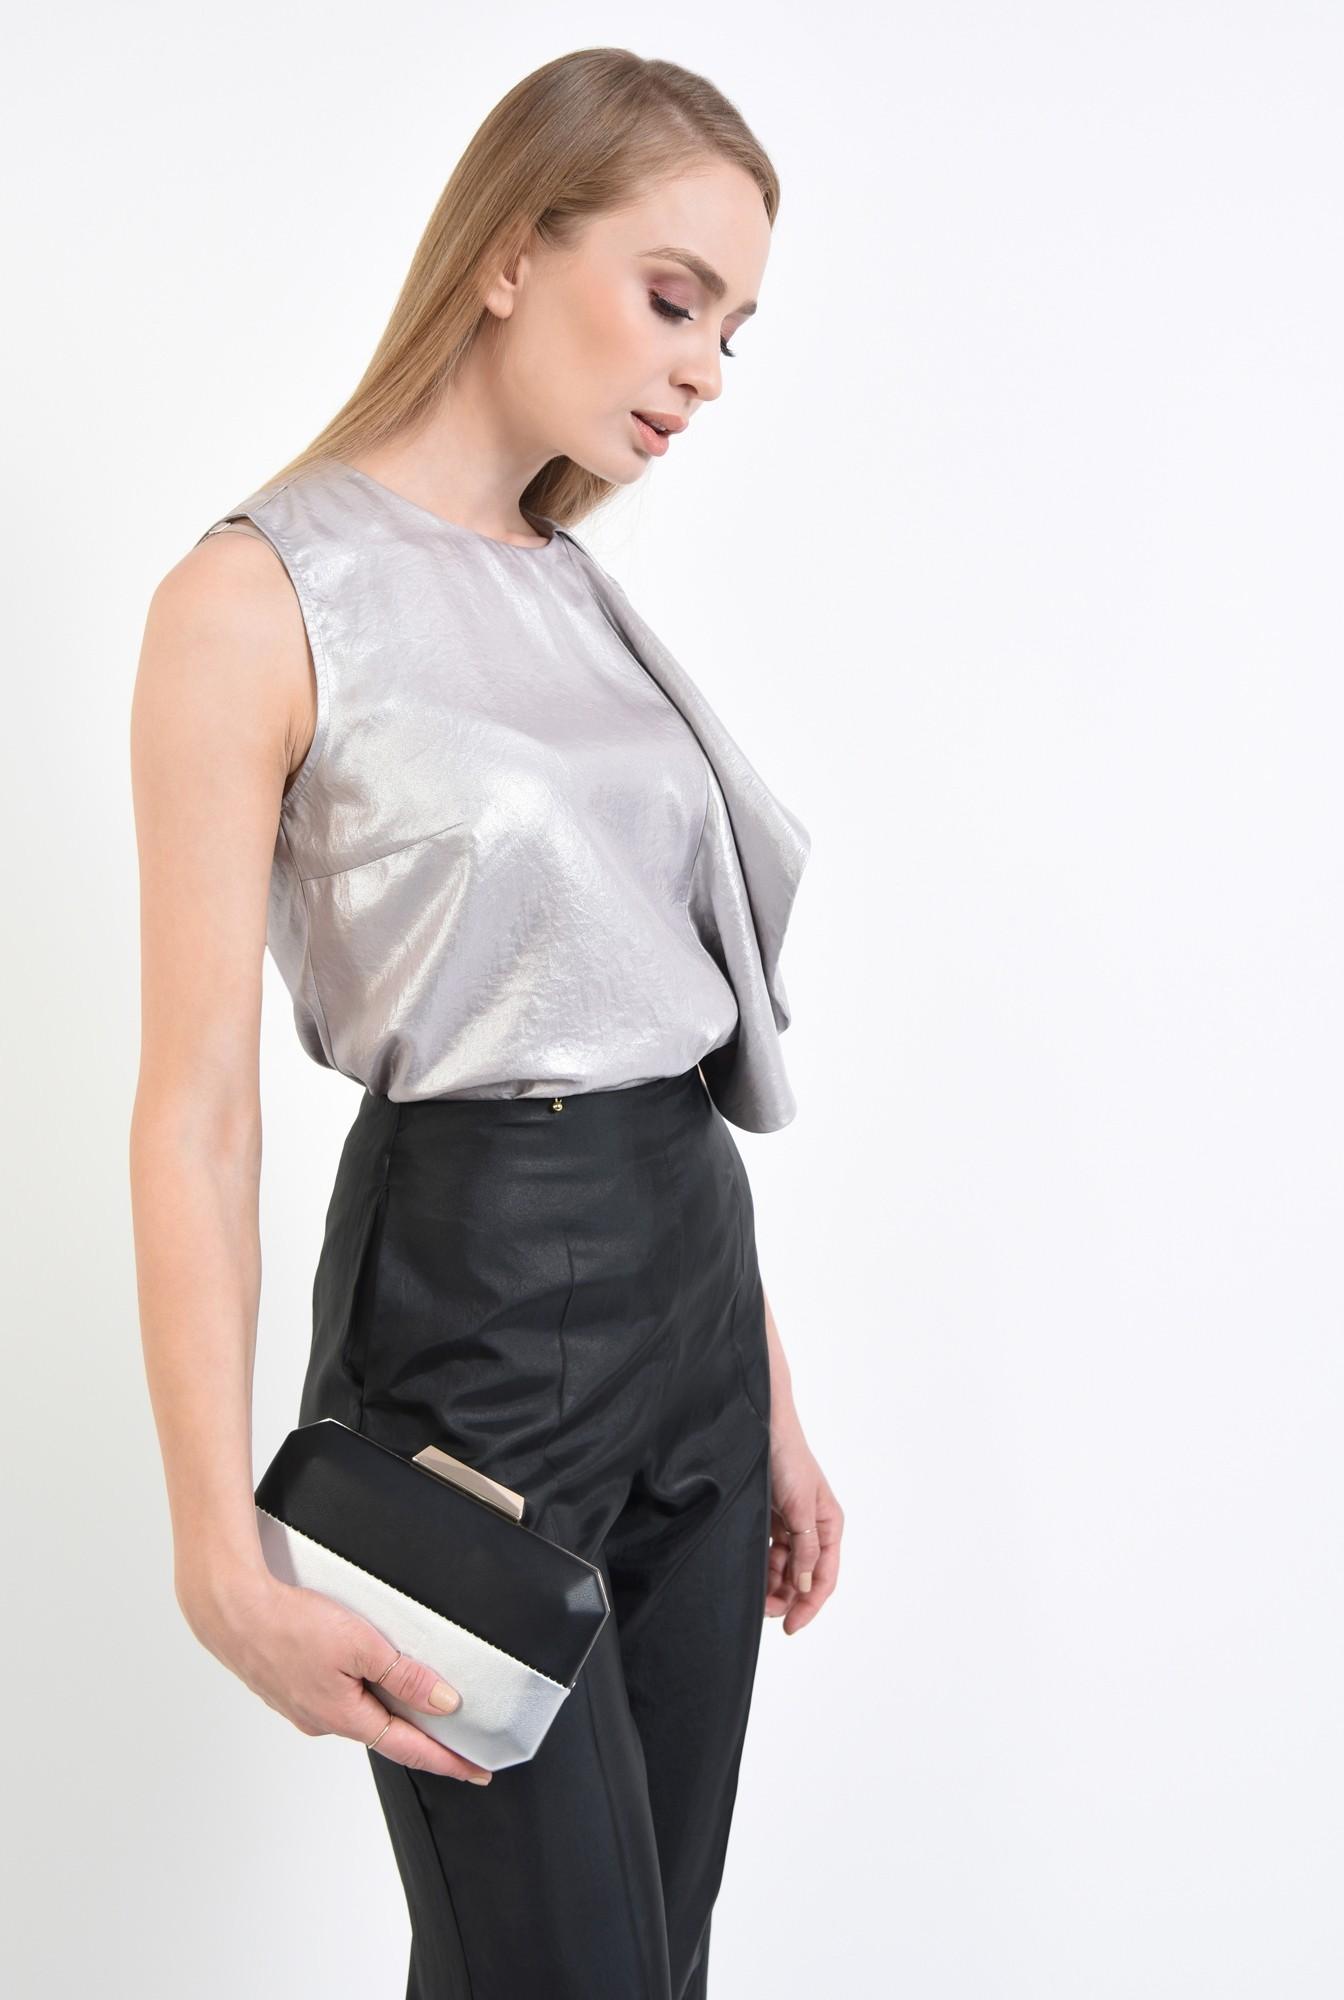 2 - plic bicolor, negru, argintiu, lant detasabil